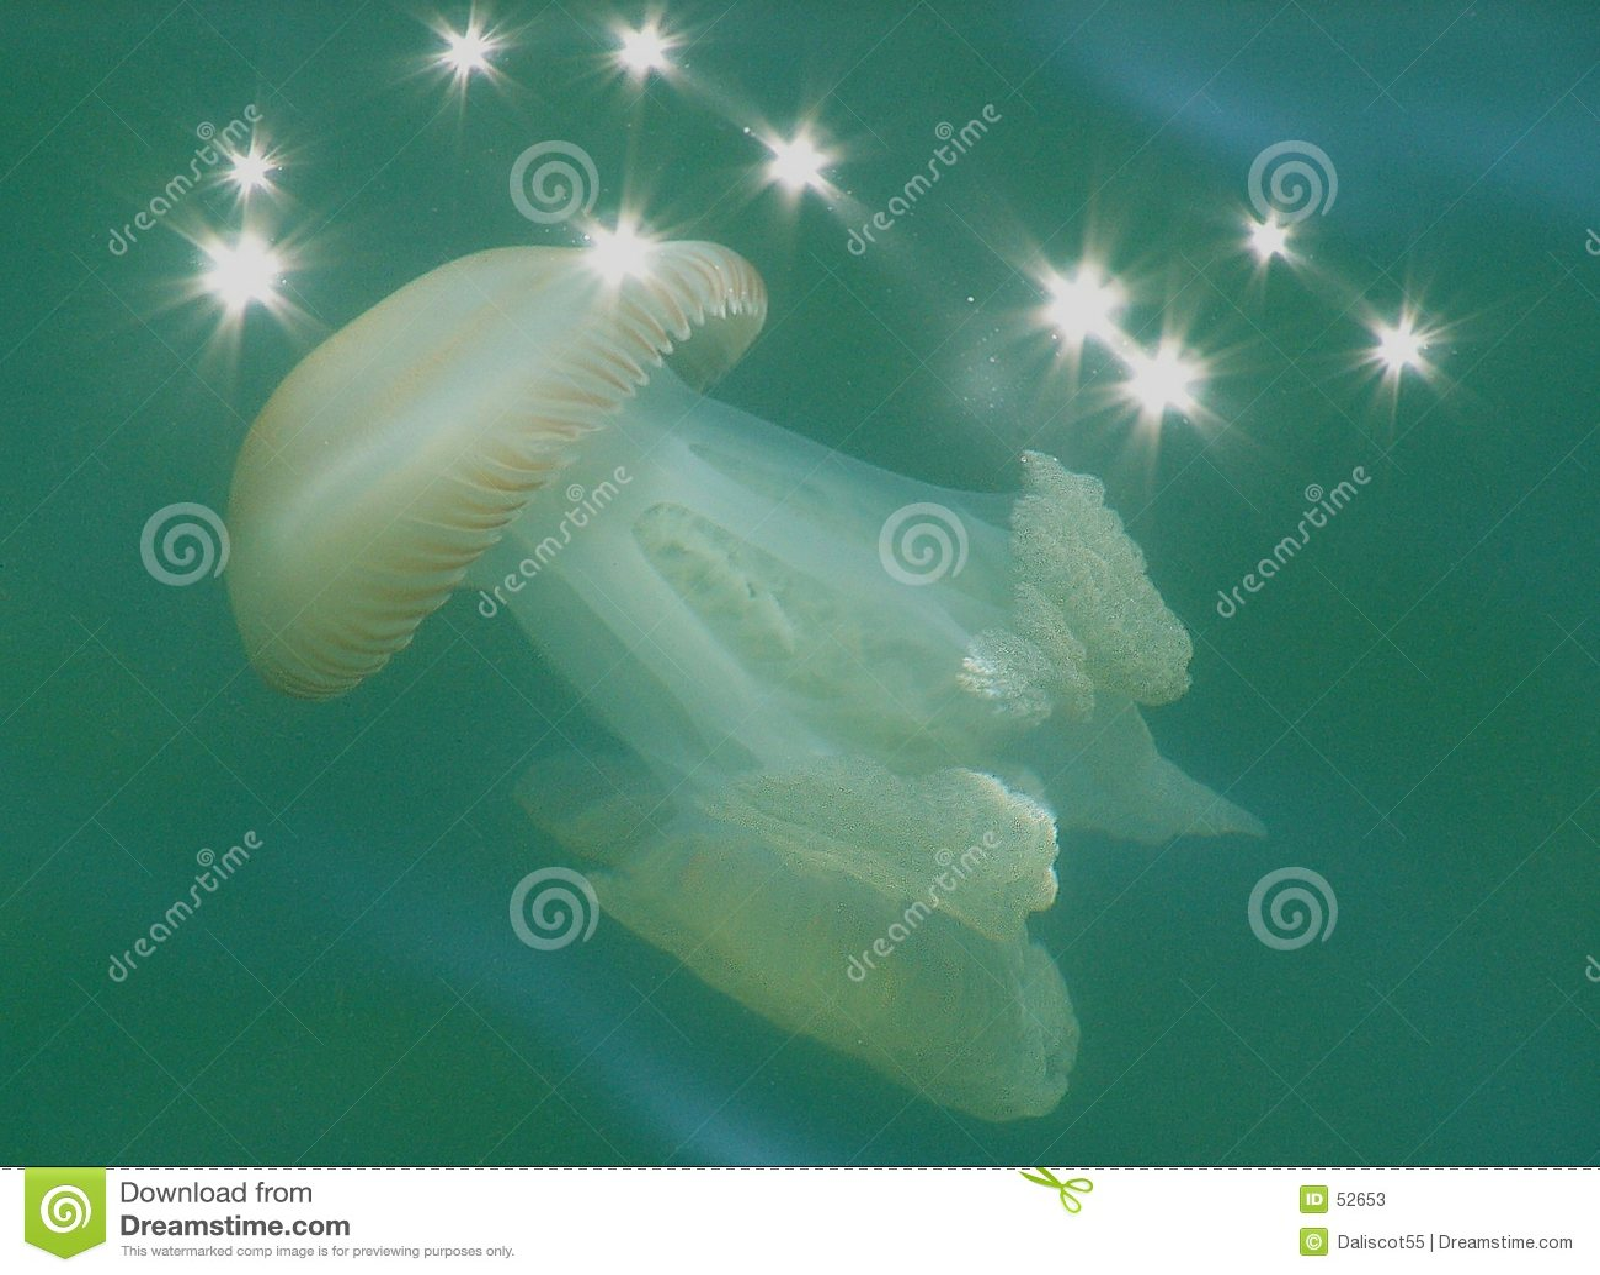 Meduza starlit